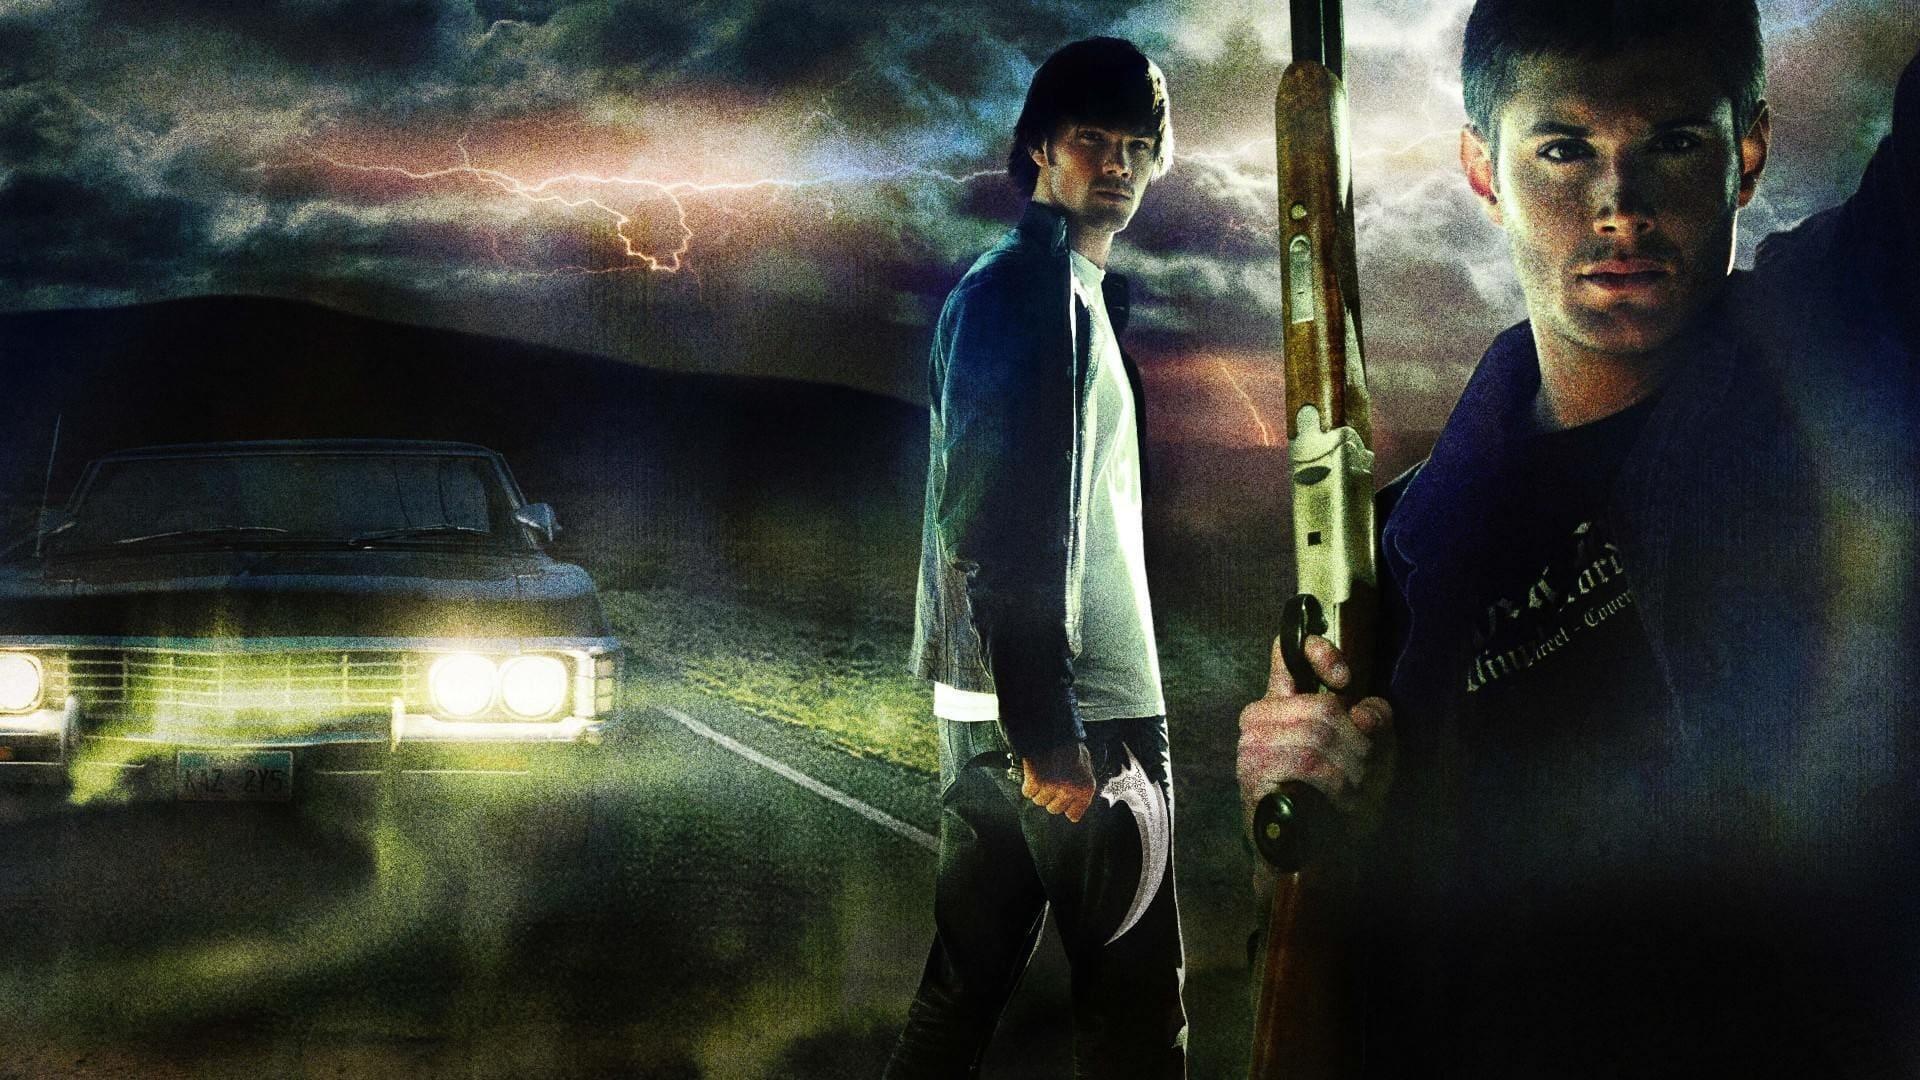 Supernatural - Season 14 Episode 11 Damaged Goods